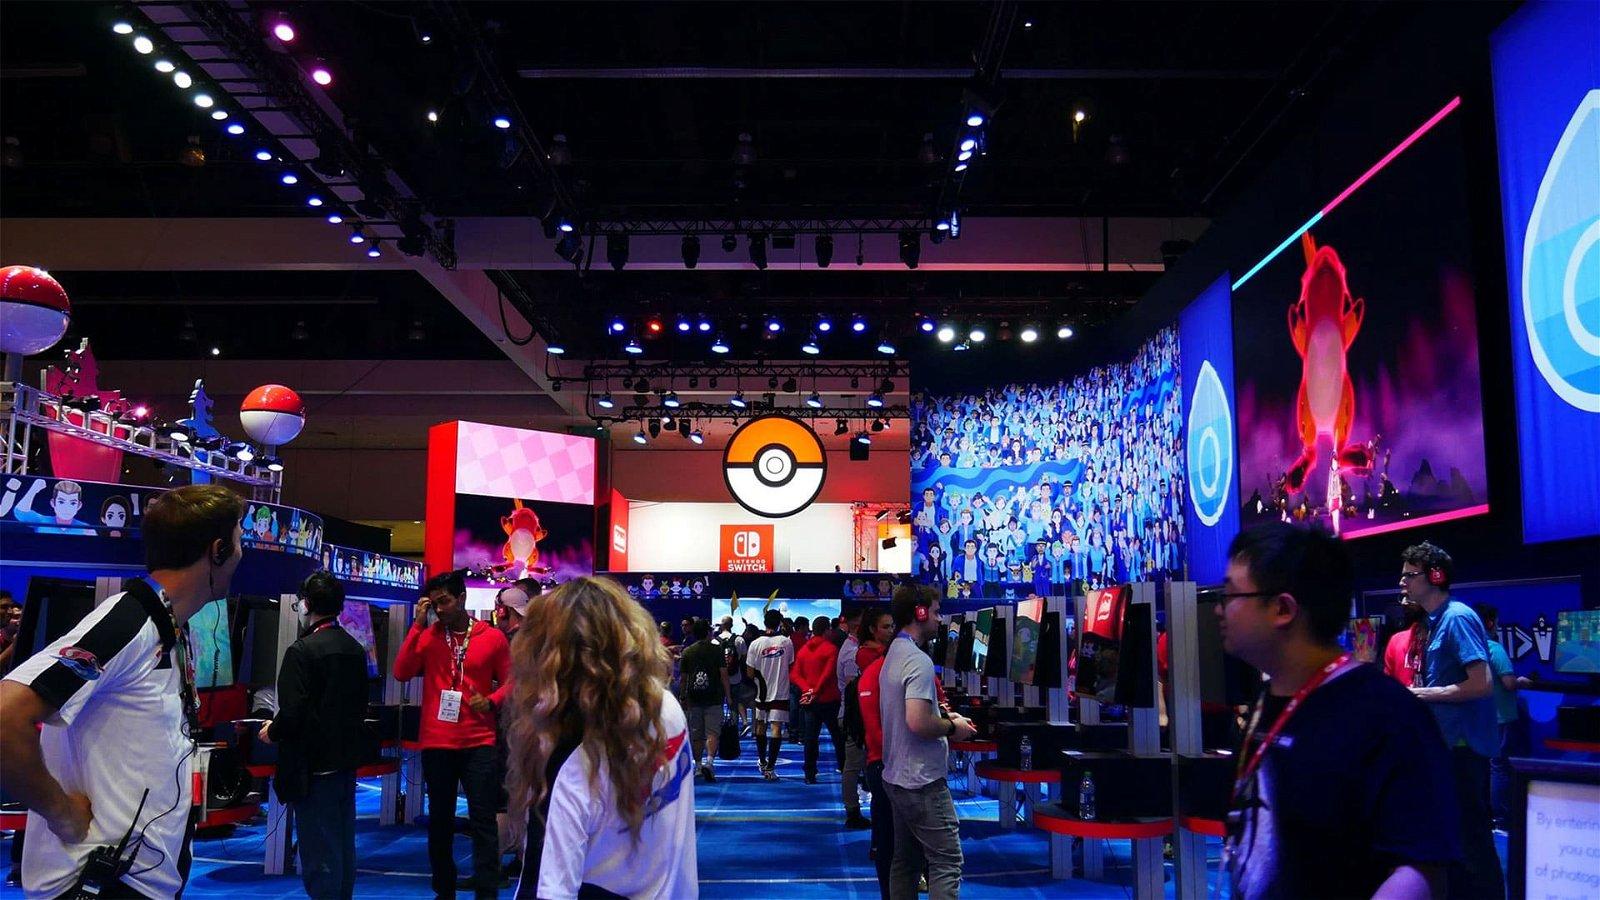 Nintendo E3 2019: Luigi's Mansion and Pokémon Sword and Shield Spotlight 4